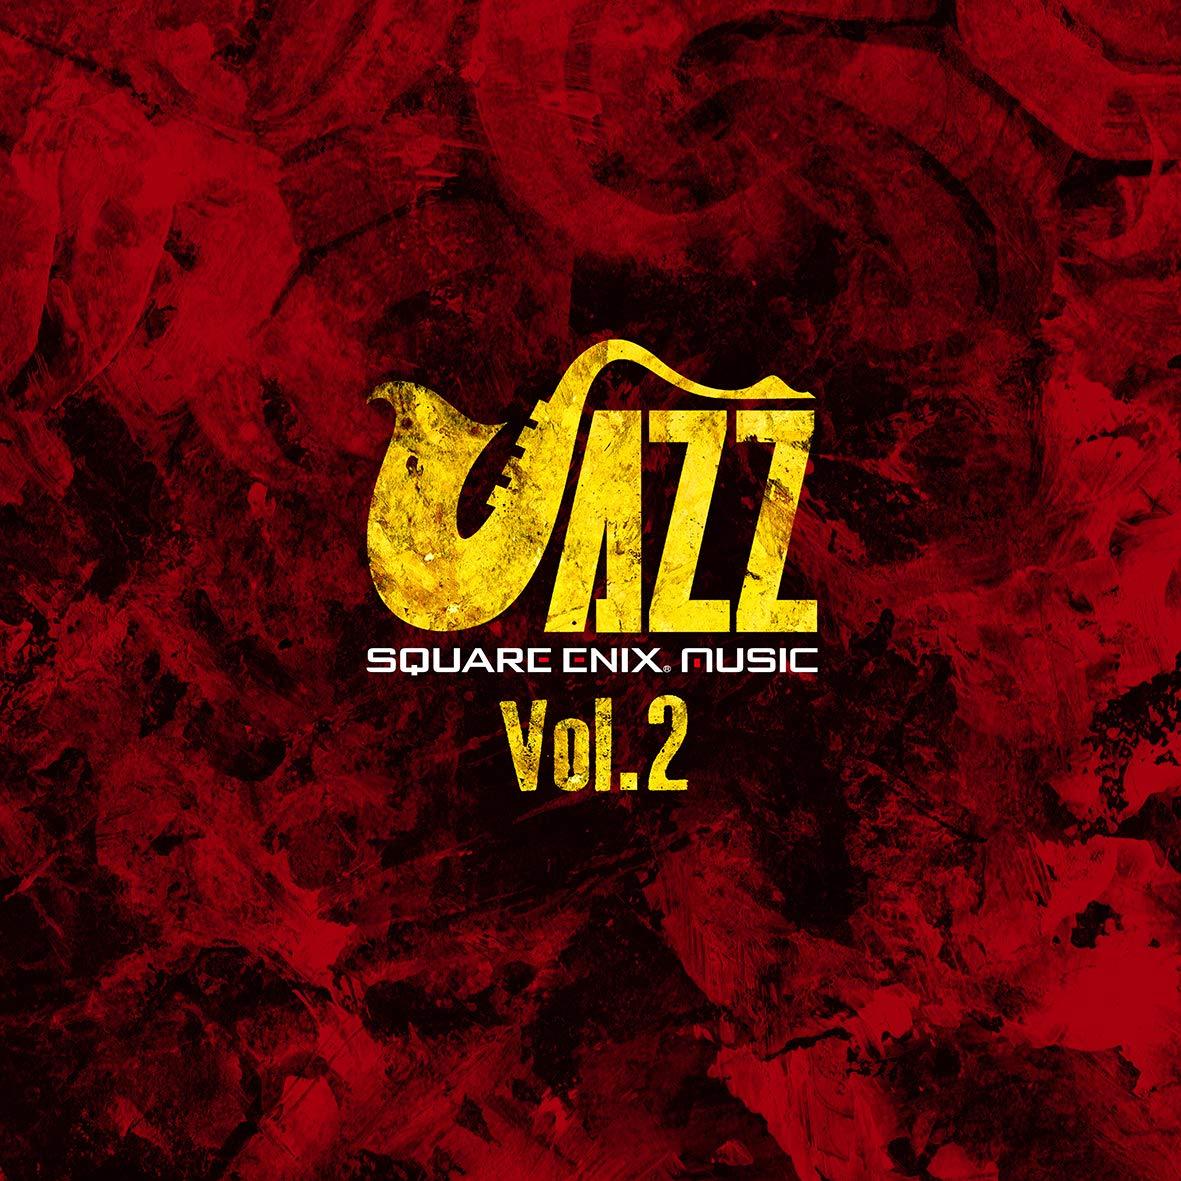 VA – SQUARE ENIX JAZZ Vol.2 [FLAC / CD] [2018.12.19]